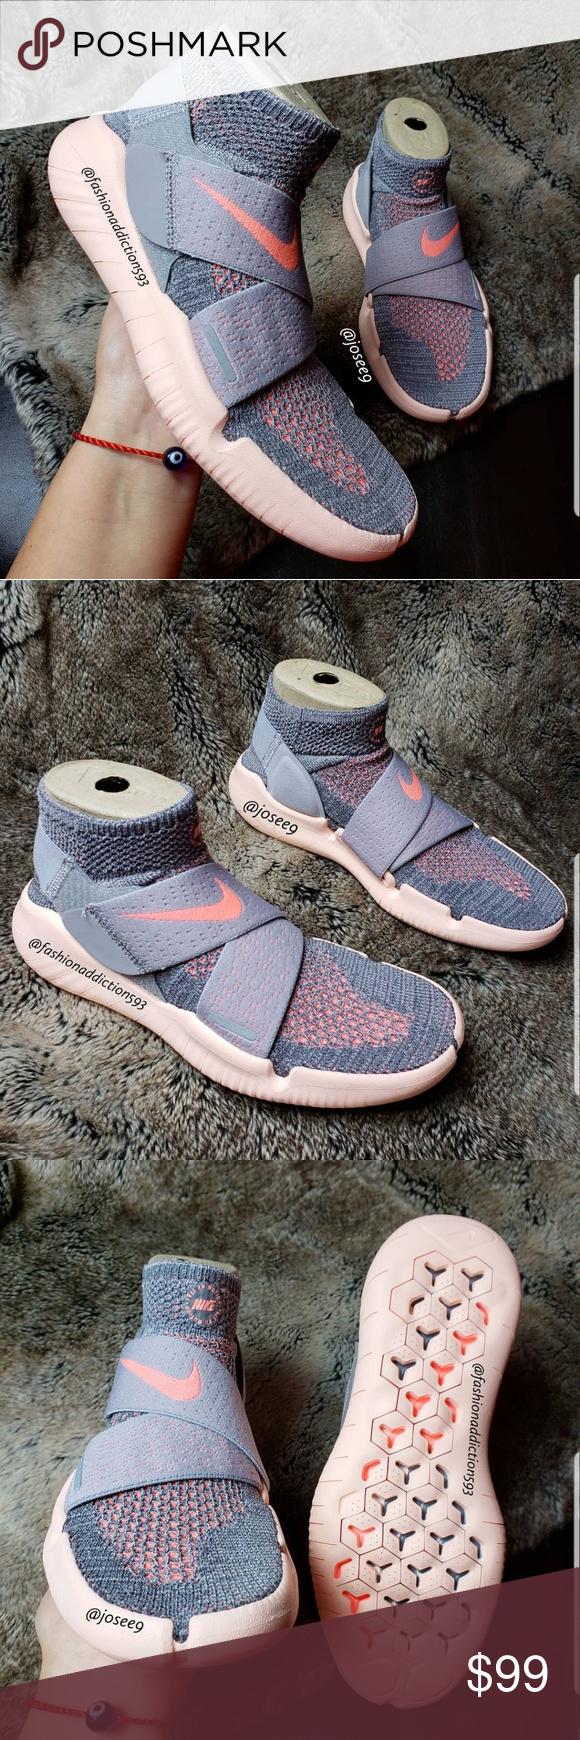 Nike Free RN Motion FK 2018 grey peach sneakers Size 5.5Y